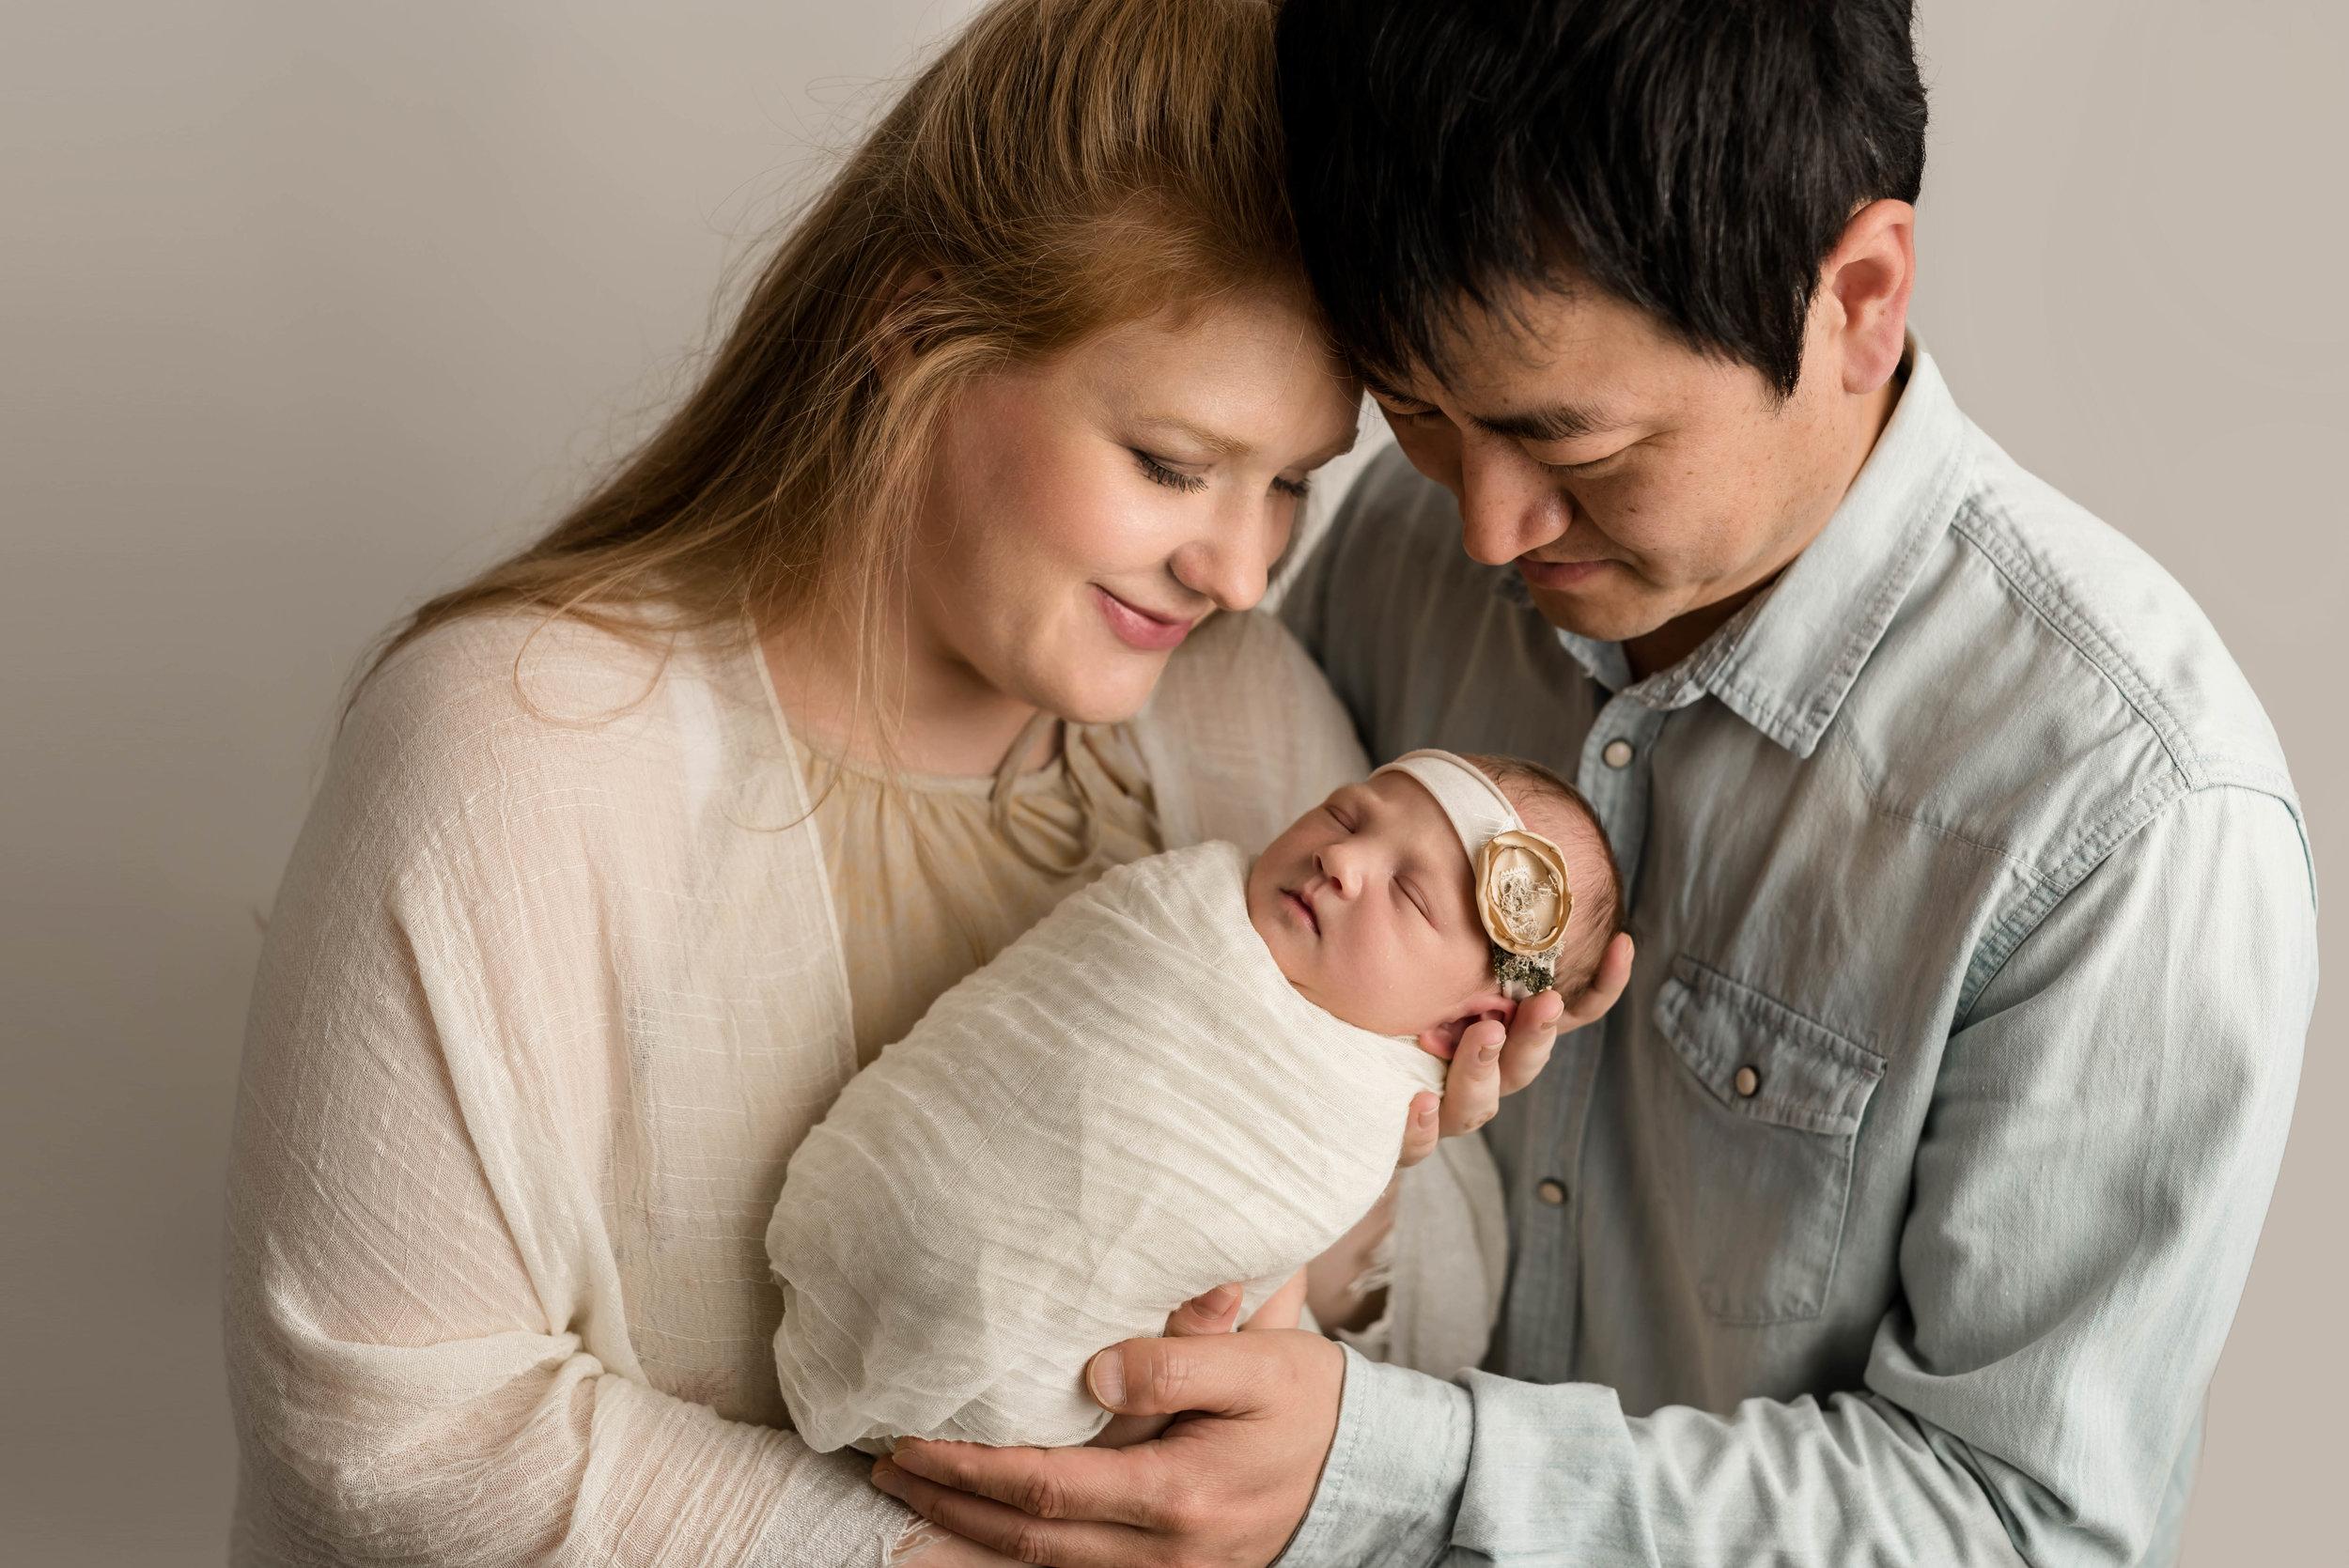 korean american family loving on their new baby girl at junebug photography studio in manhattan, kansas